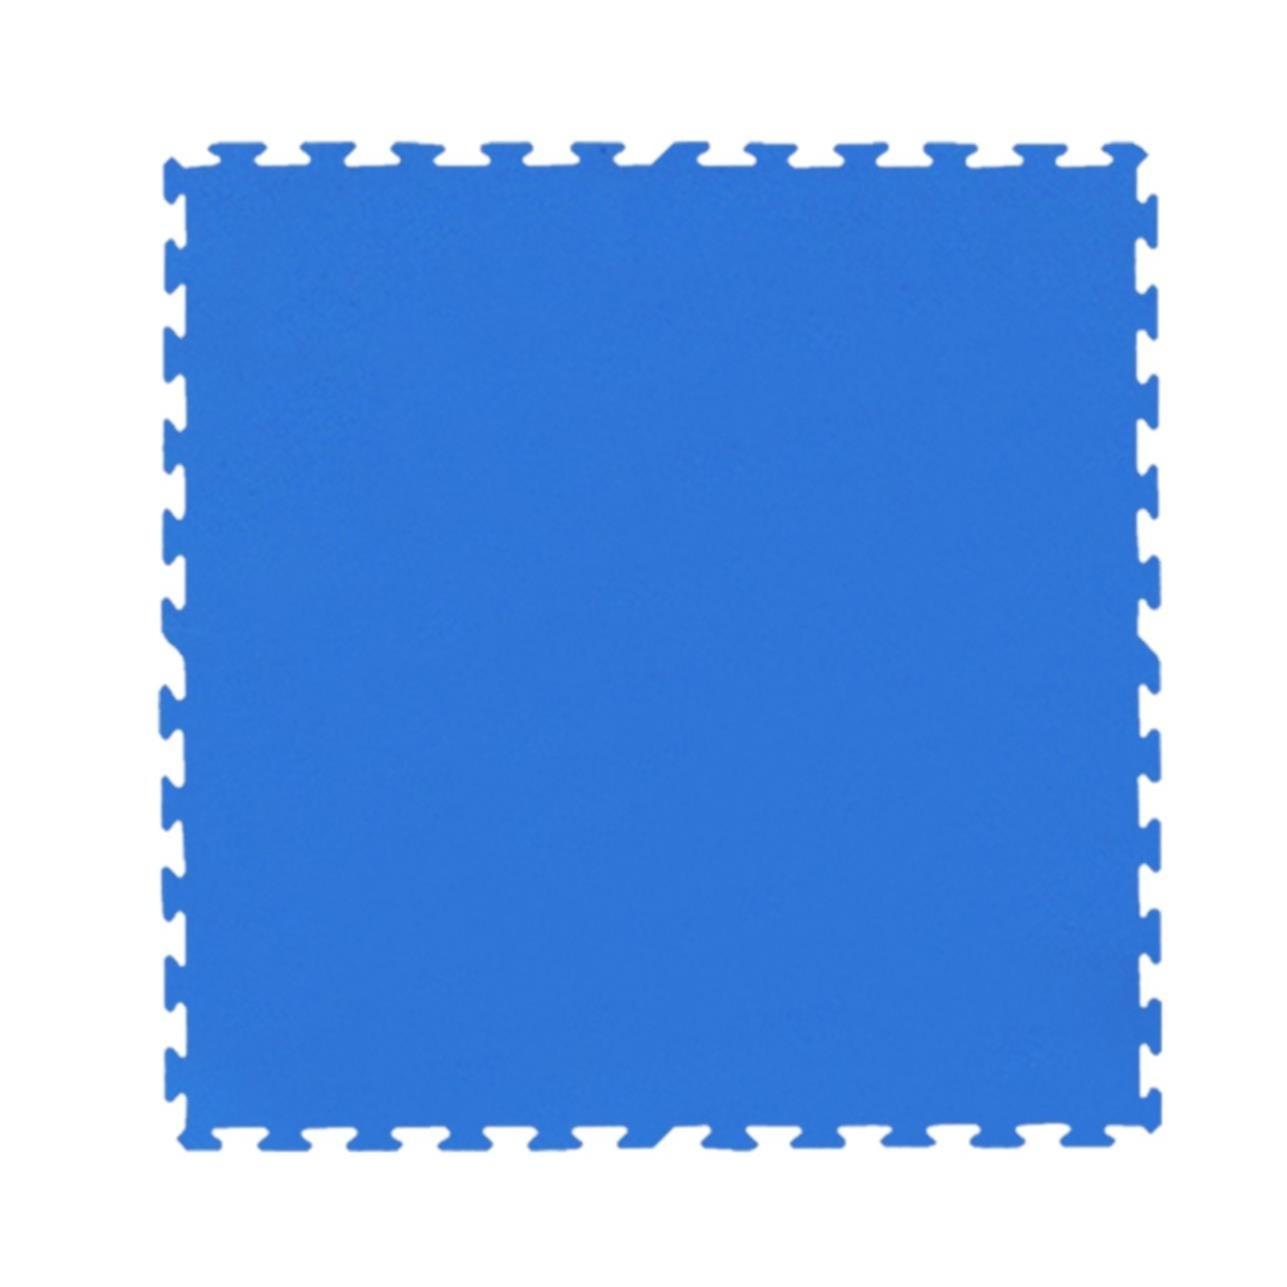 Tatame de Borracha EVA 100x100 cm Azul - Ibel